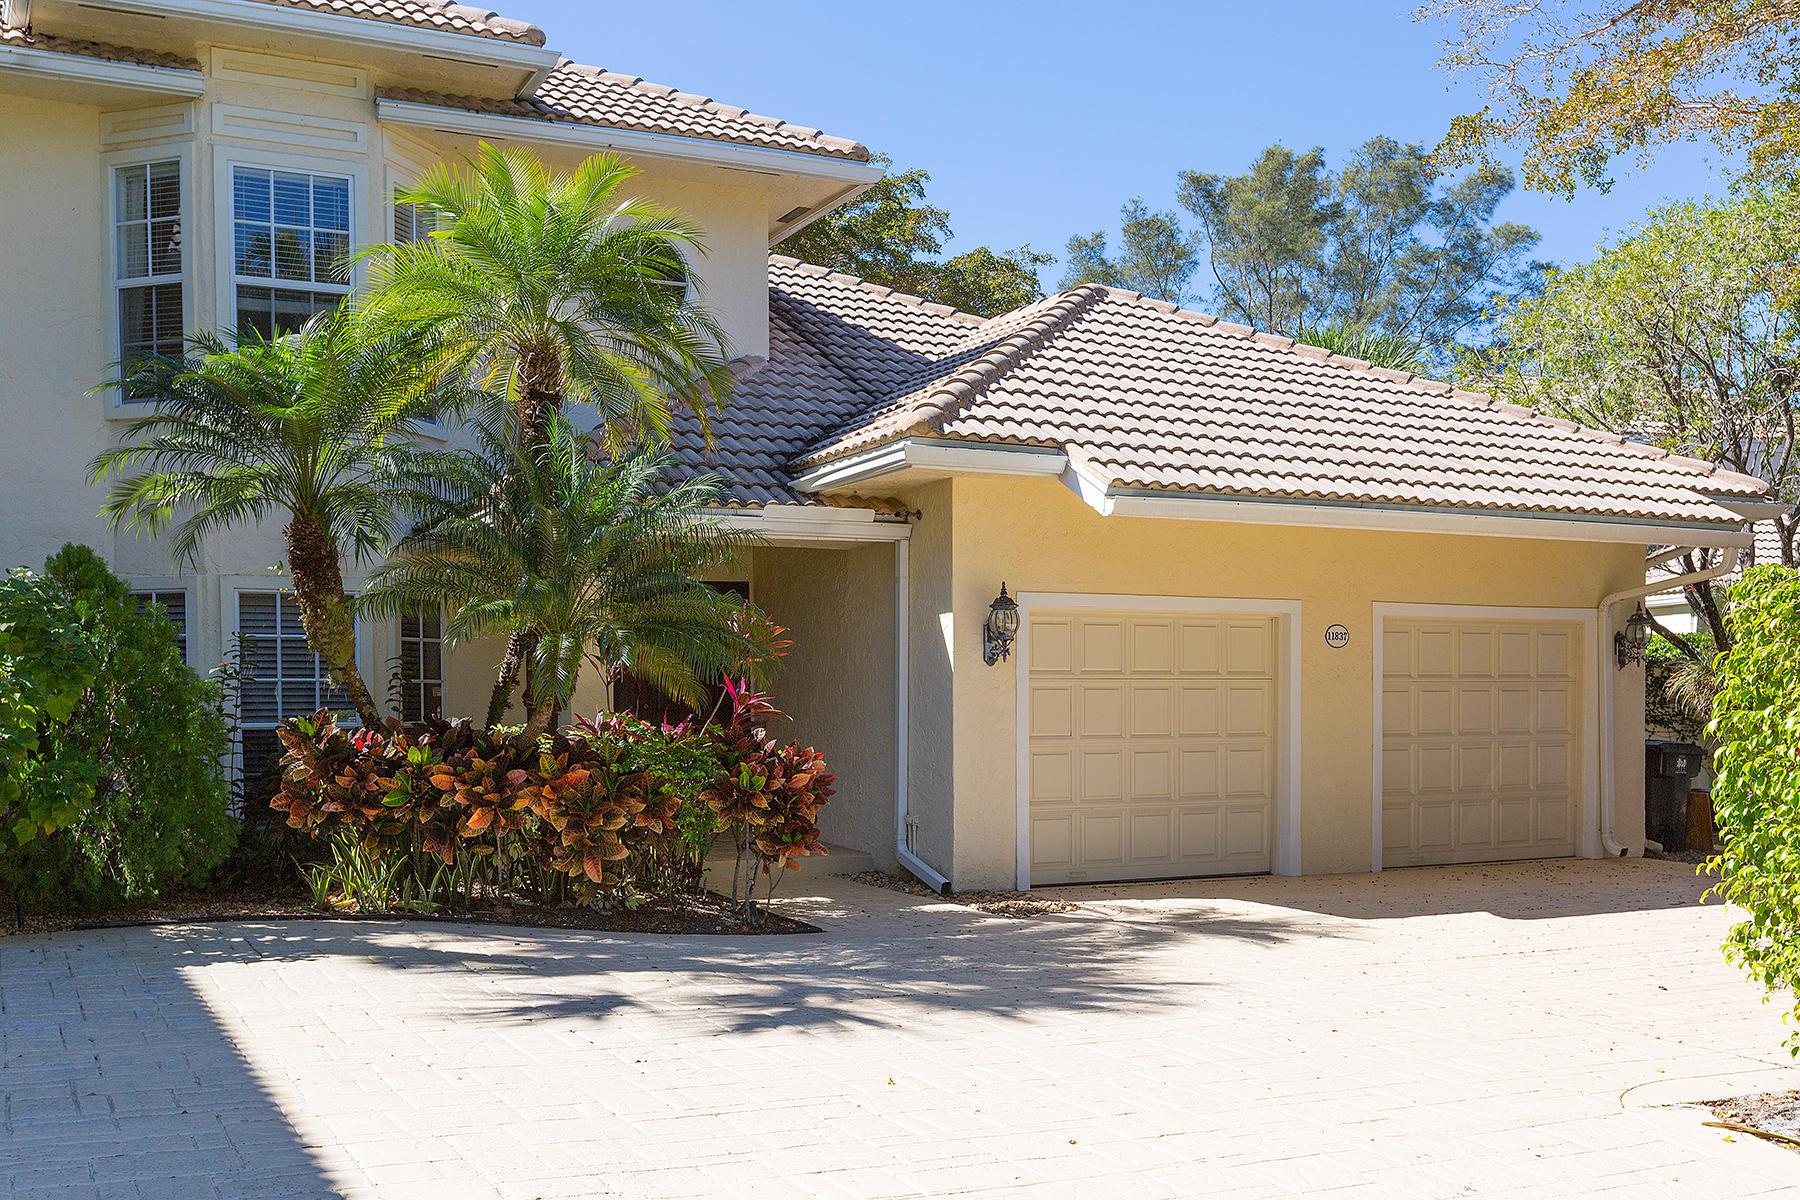 11837 Pebblewood Drive, Wellington, Florida 33414, 3 Bedrooms Bedrooms, ,3 BathroomsBathrooms,Condo/Coop,For Sale,Palm Beach Polo Club,Pebblewood,1,RX-10503138